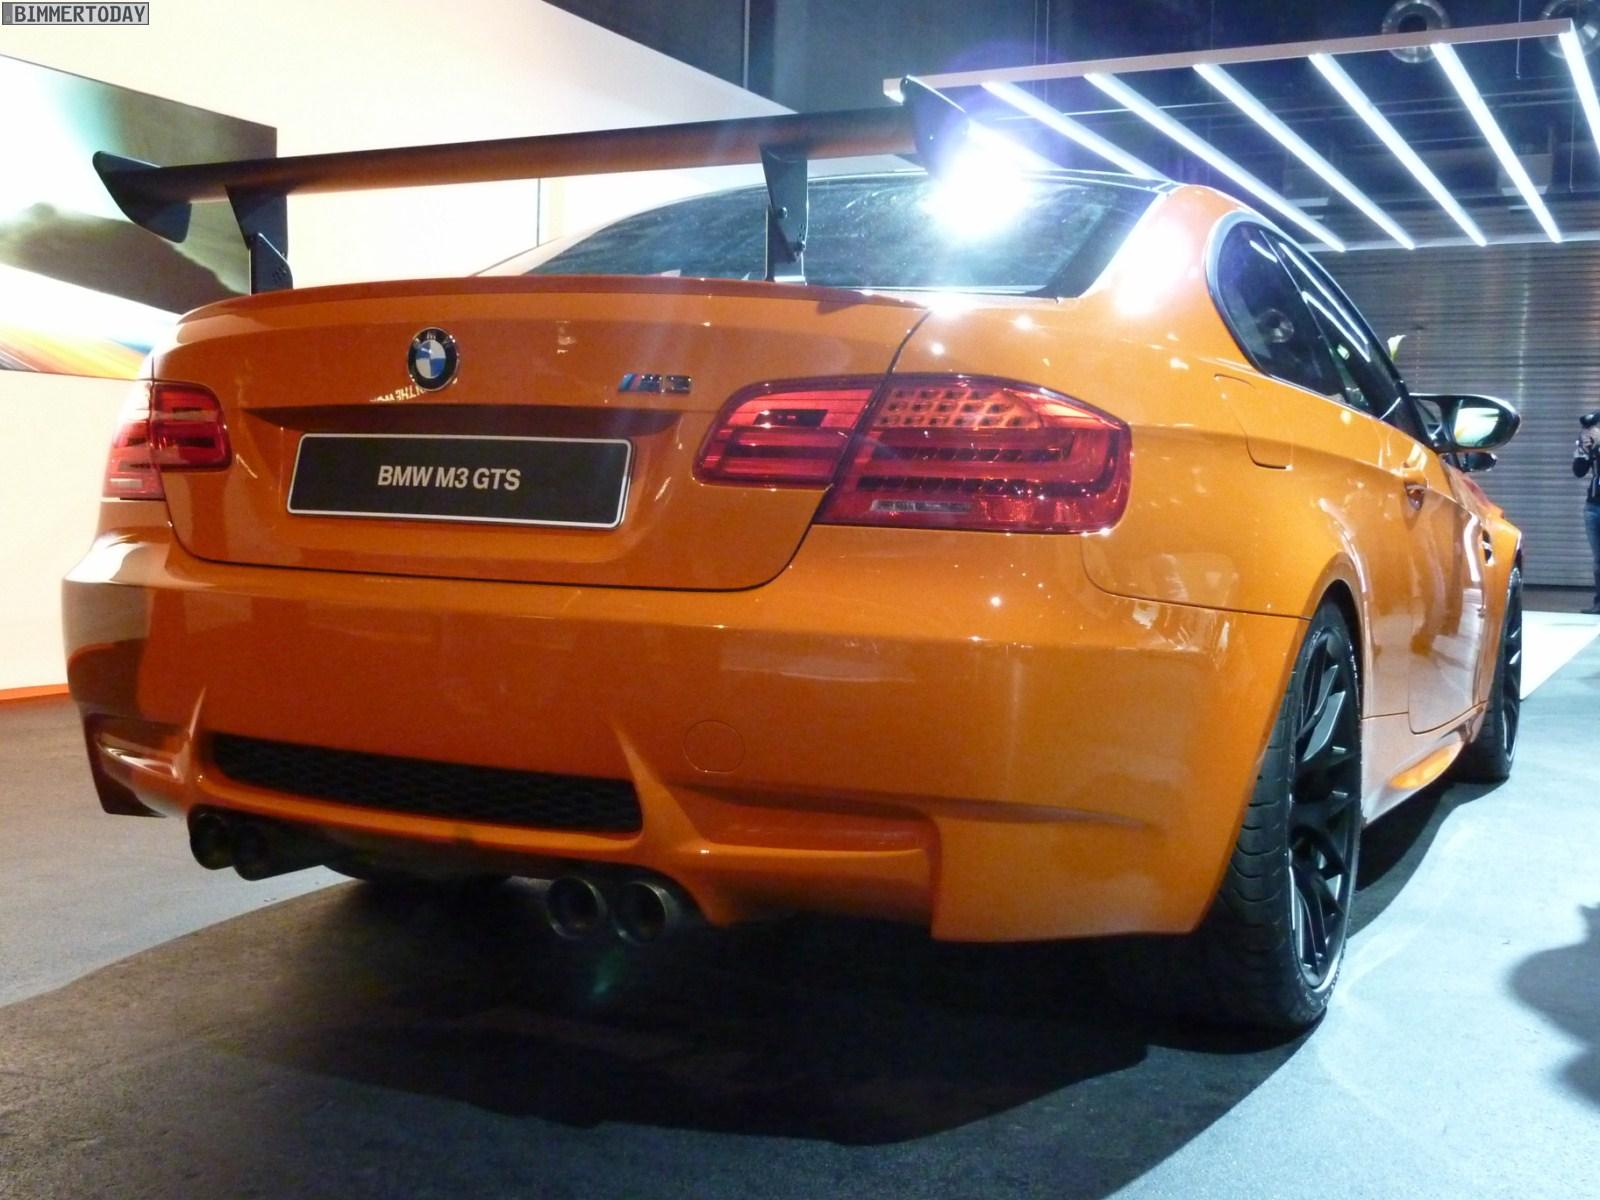 BMW-M3-GTS-Garching-01